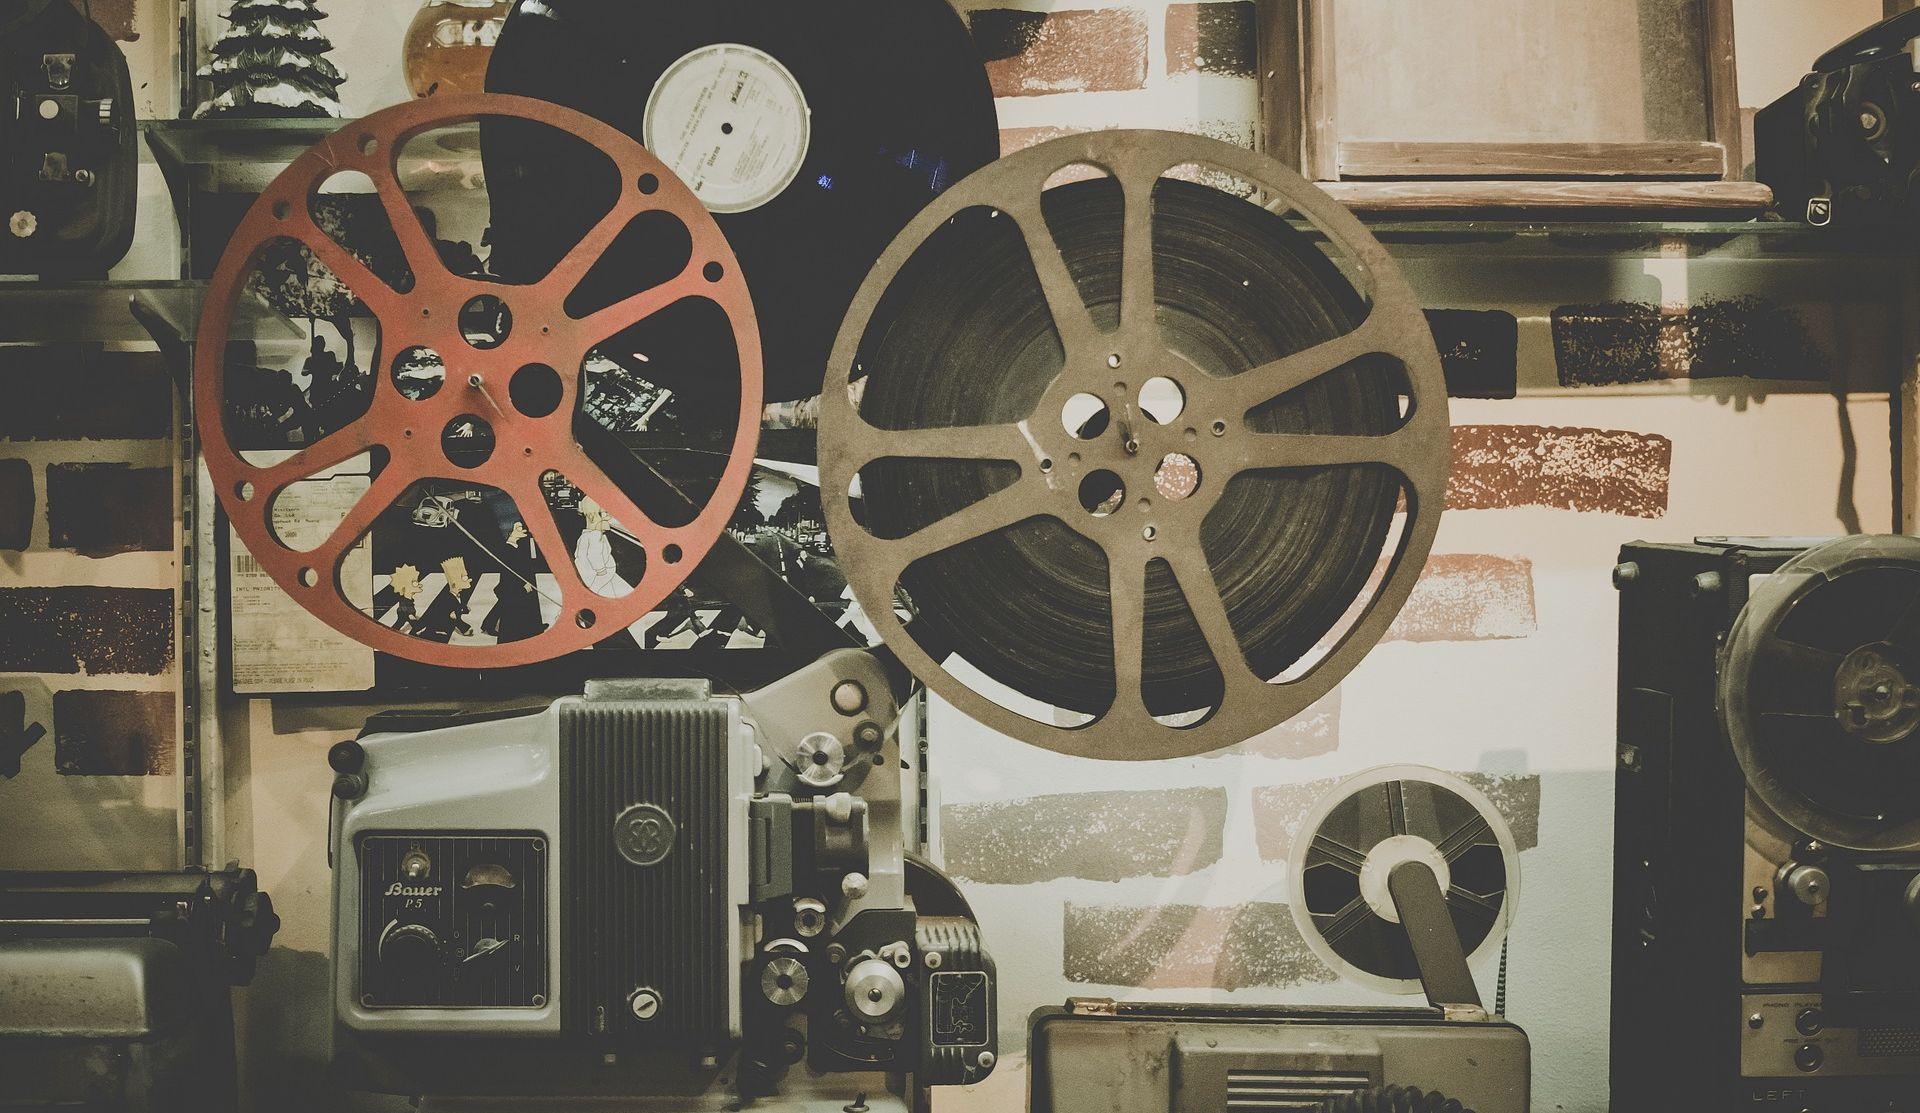 VINKOVCI 5. Antičke filmske večeri uvod u finale ovogodišnjeg DORF-a